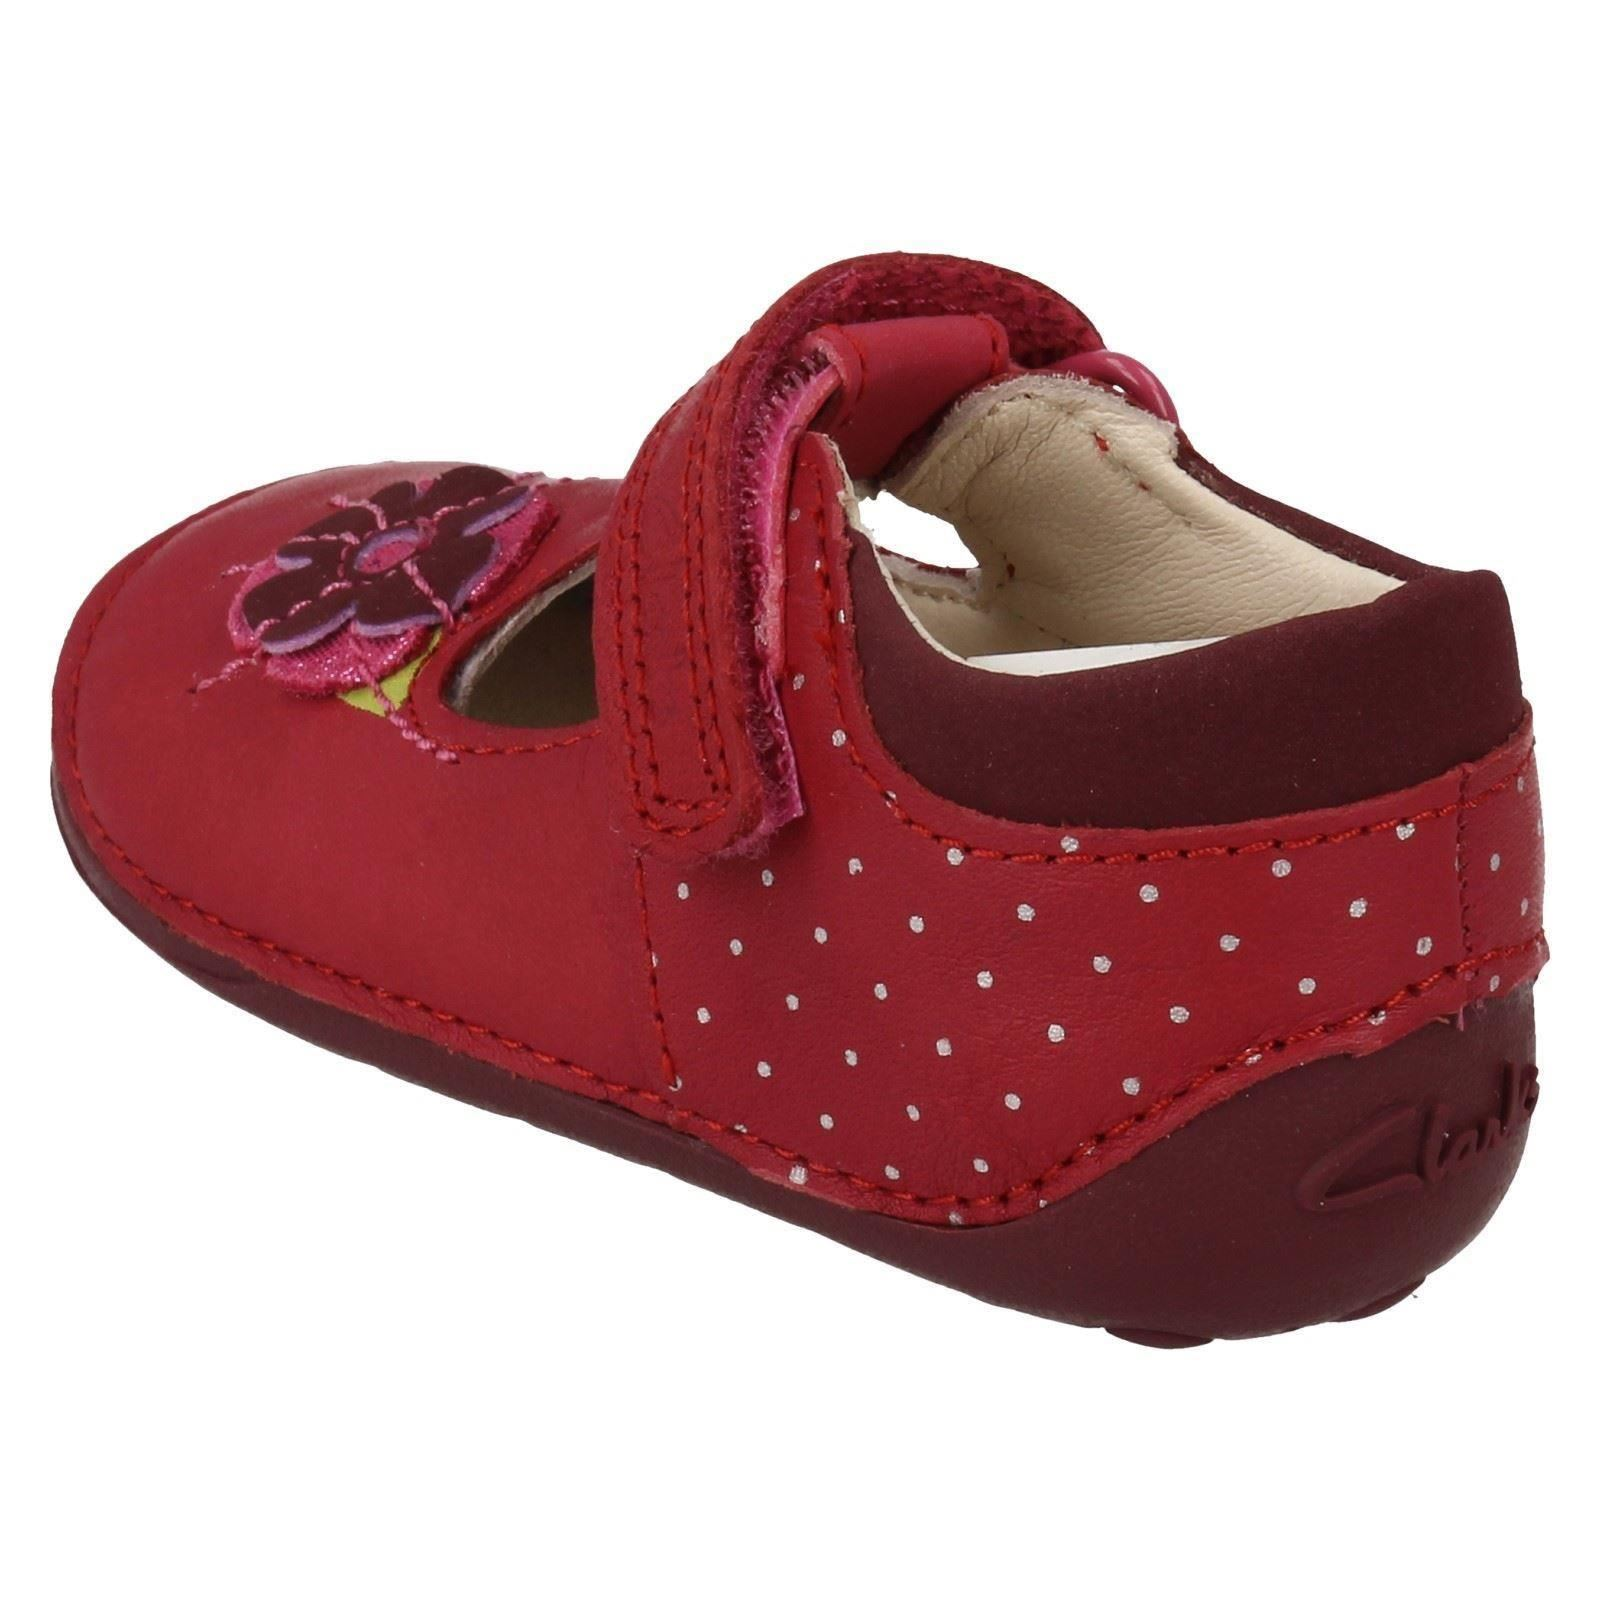 Girls Clarks Shoes Style- Little Poppy £26.00